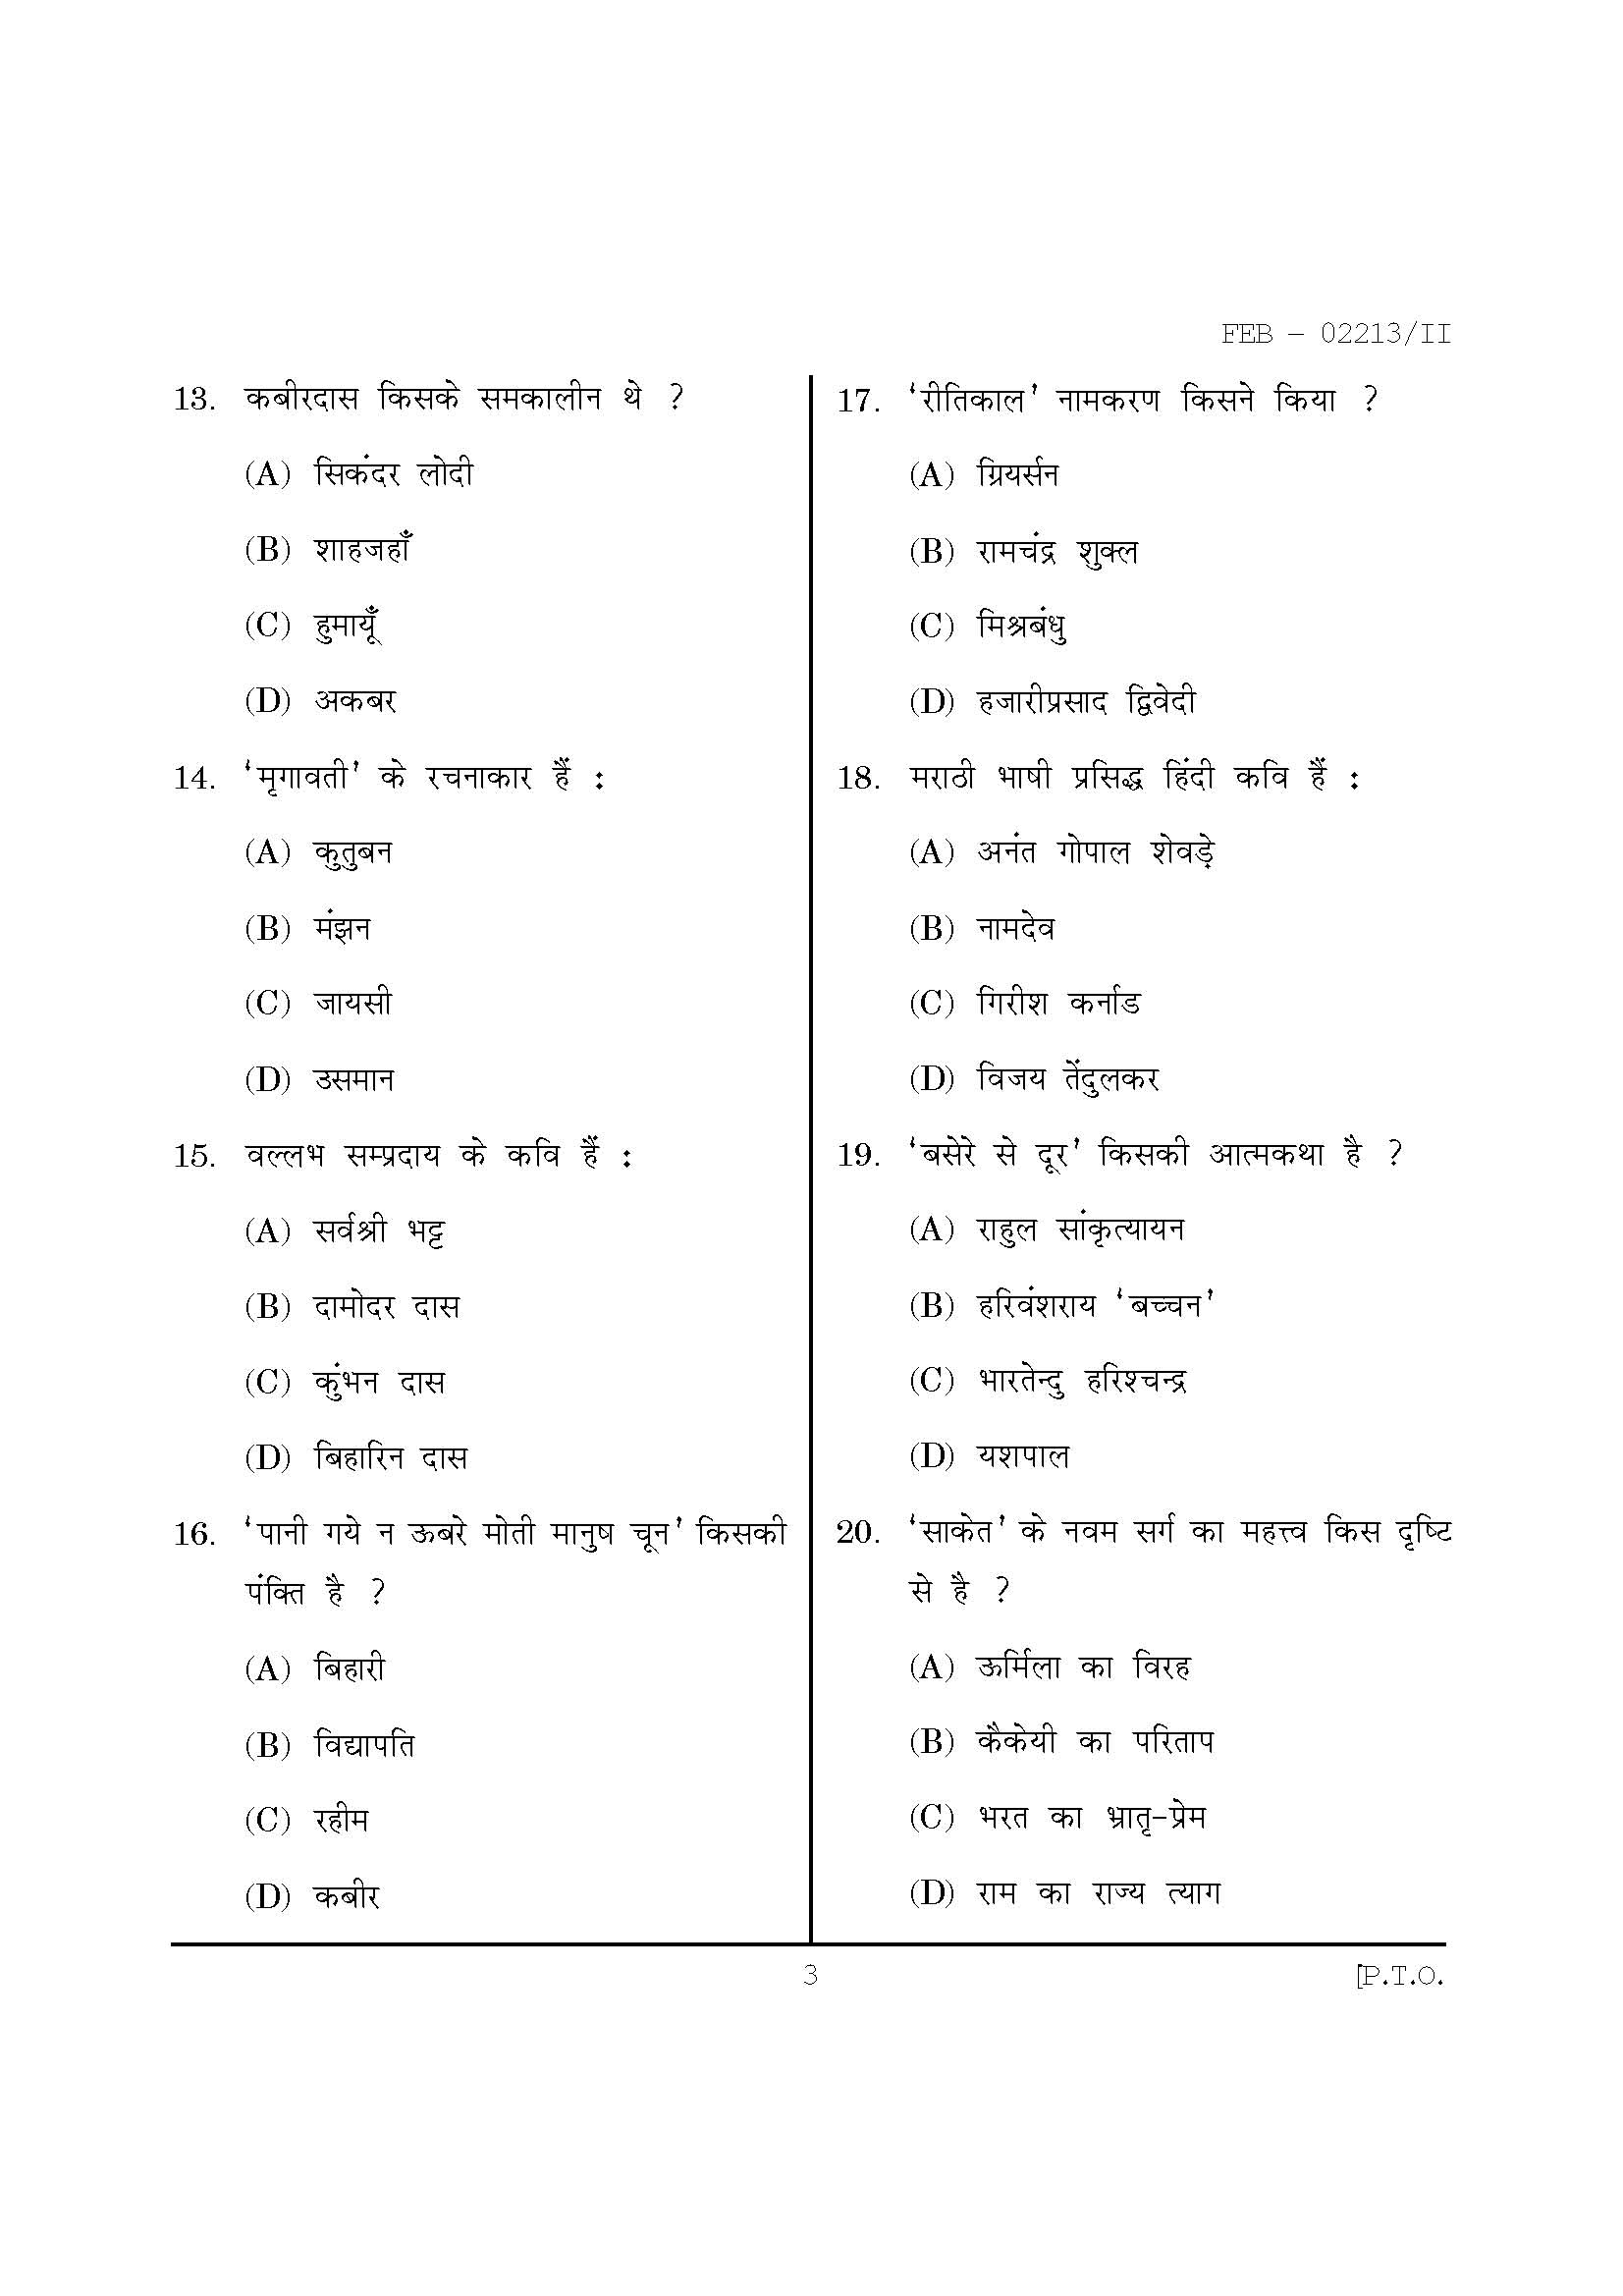 how to study for net set exam